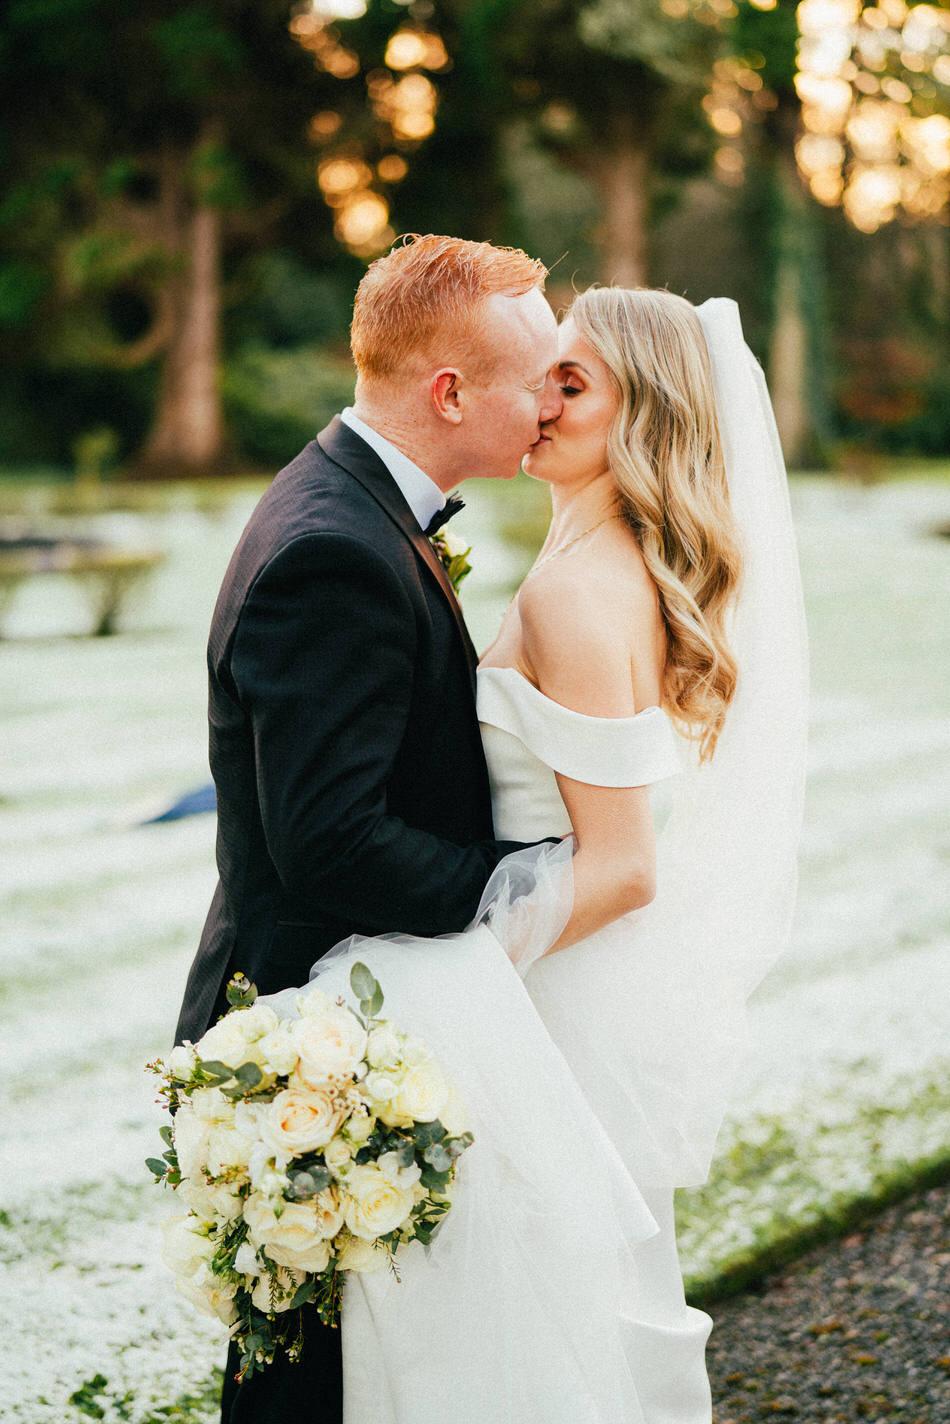 Castle-wedding-ireland-photos- 0208 149